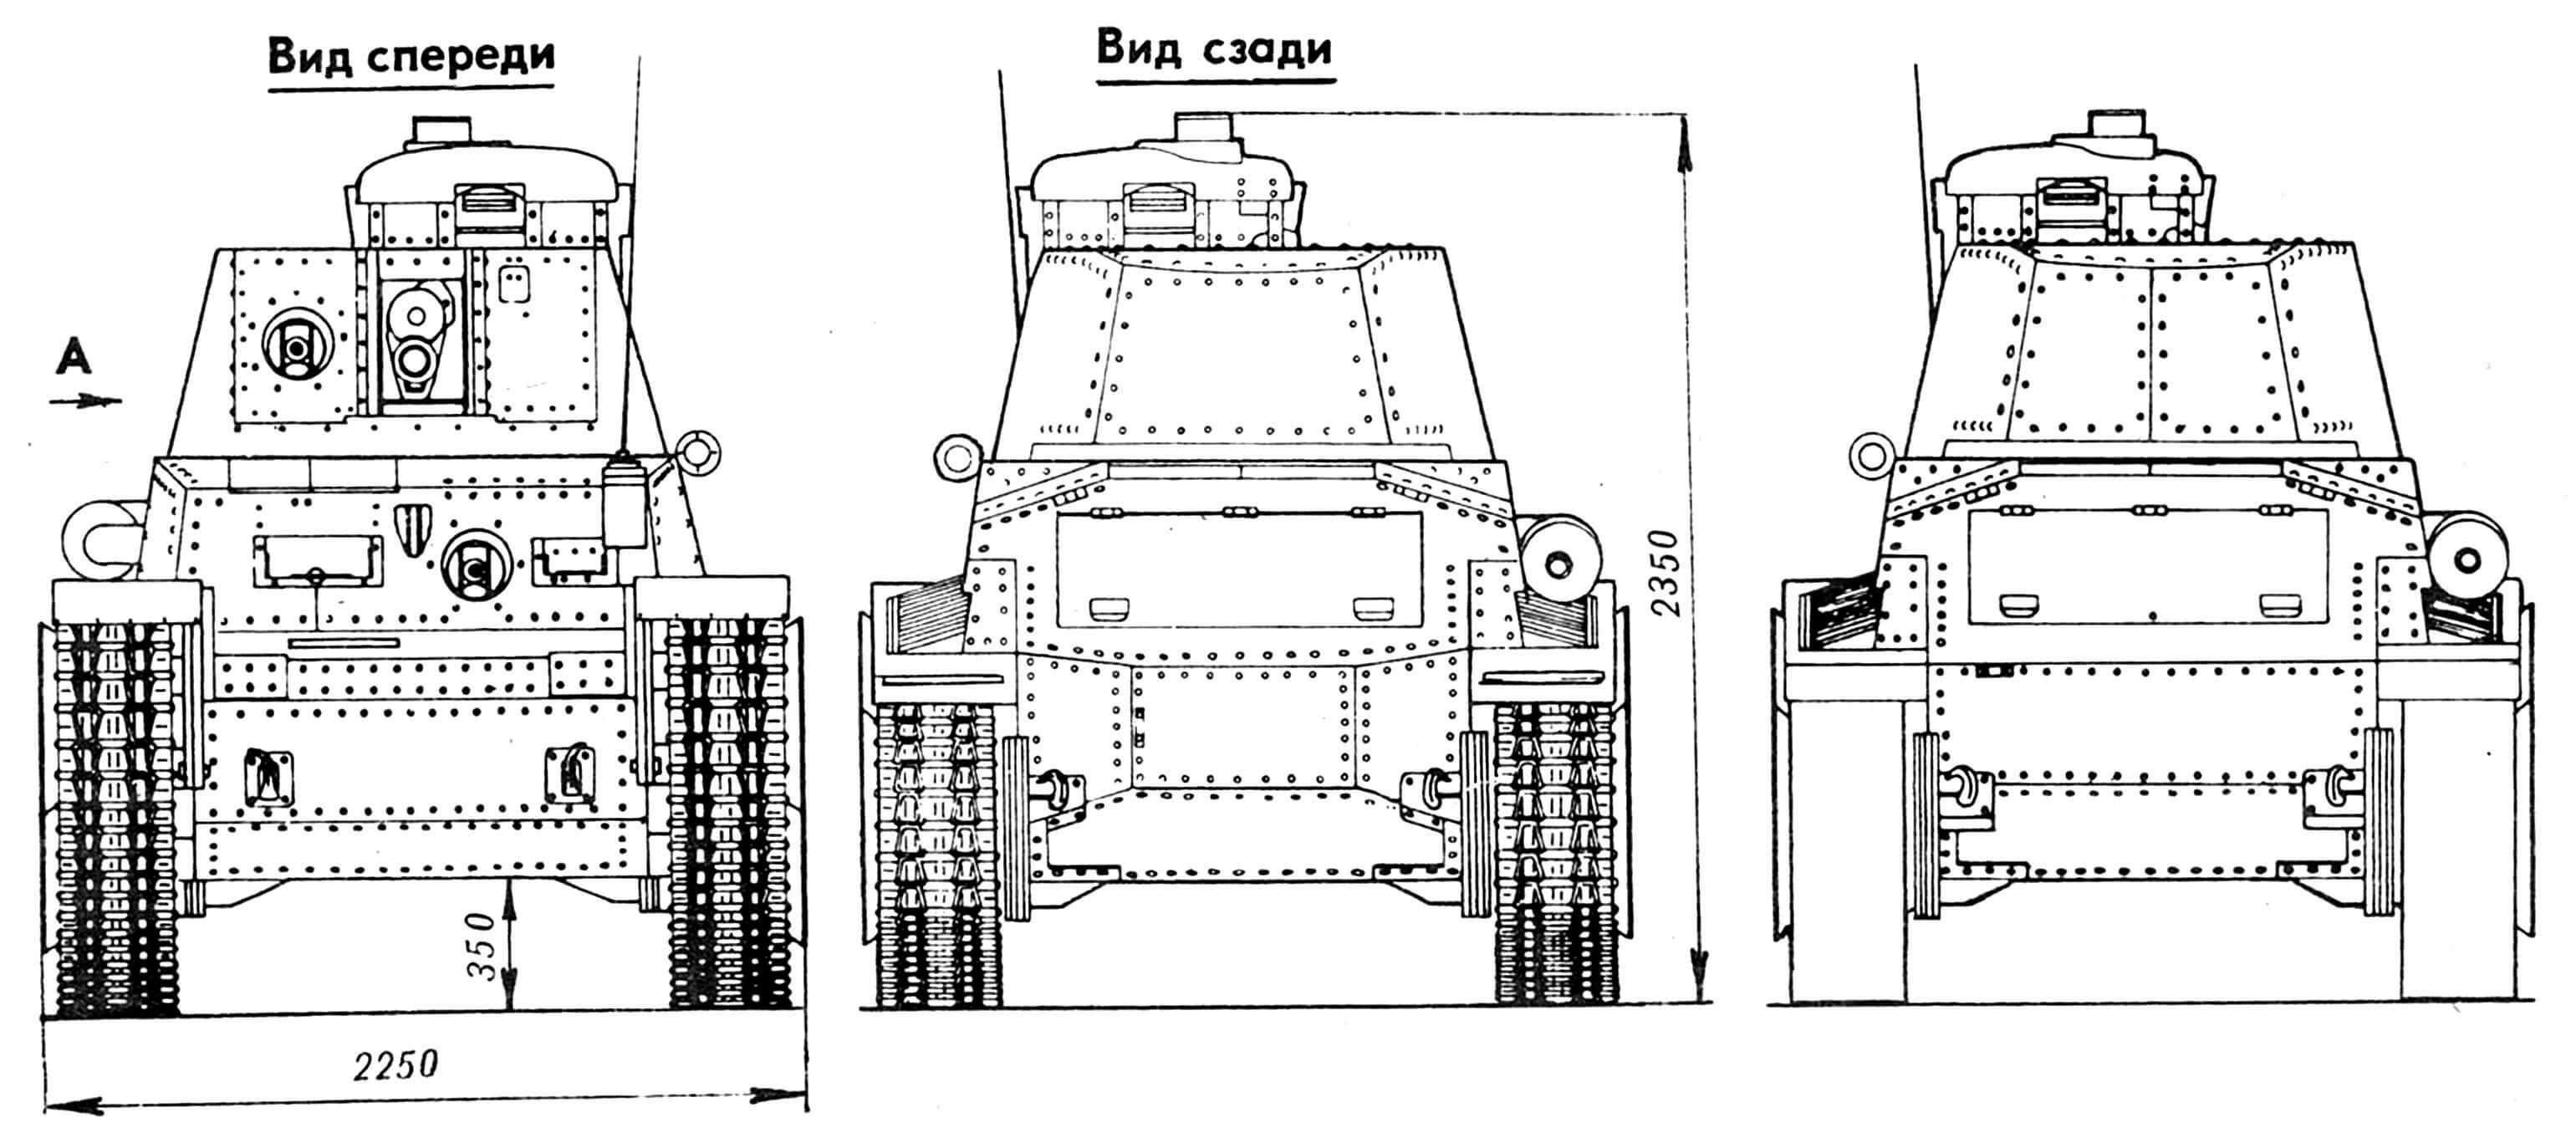 Вид сзади на румынский вариант R-2. Изменена корма башни и корпуса.